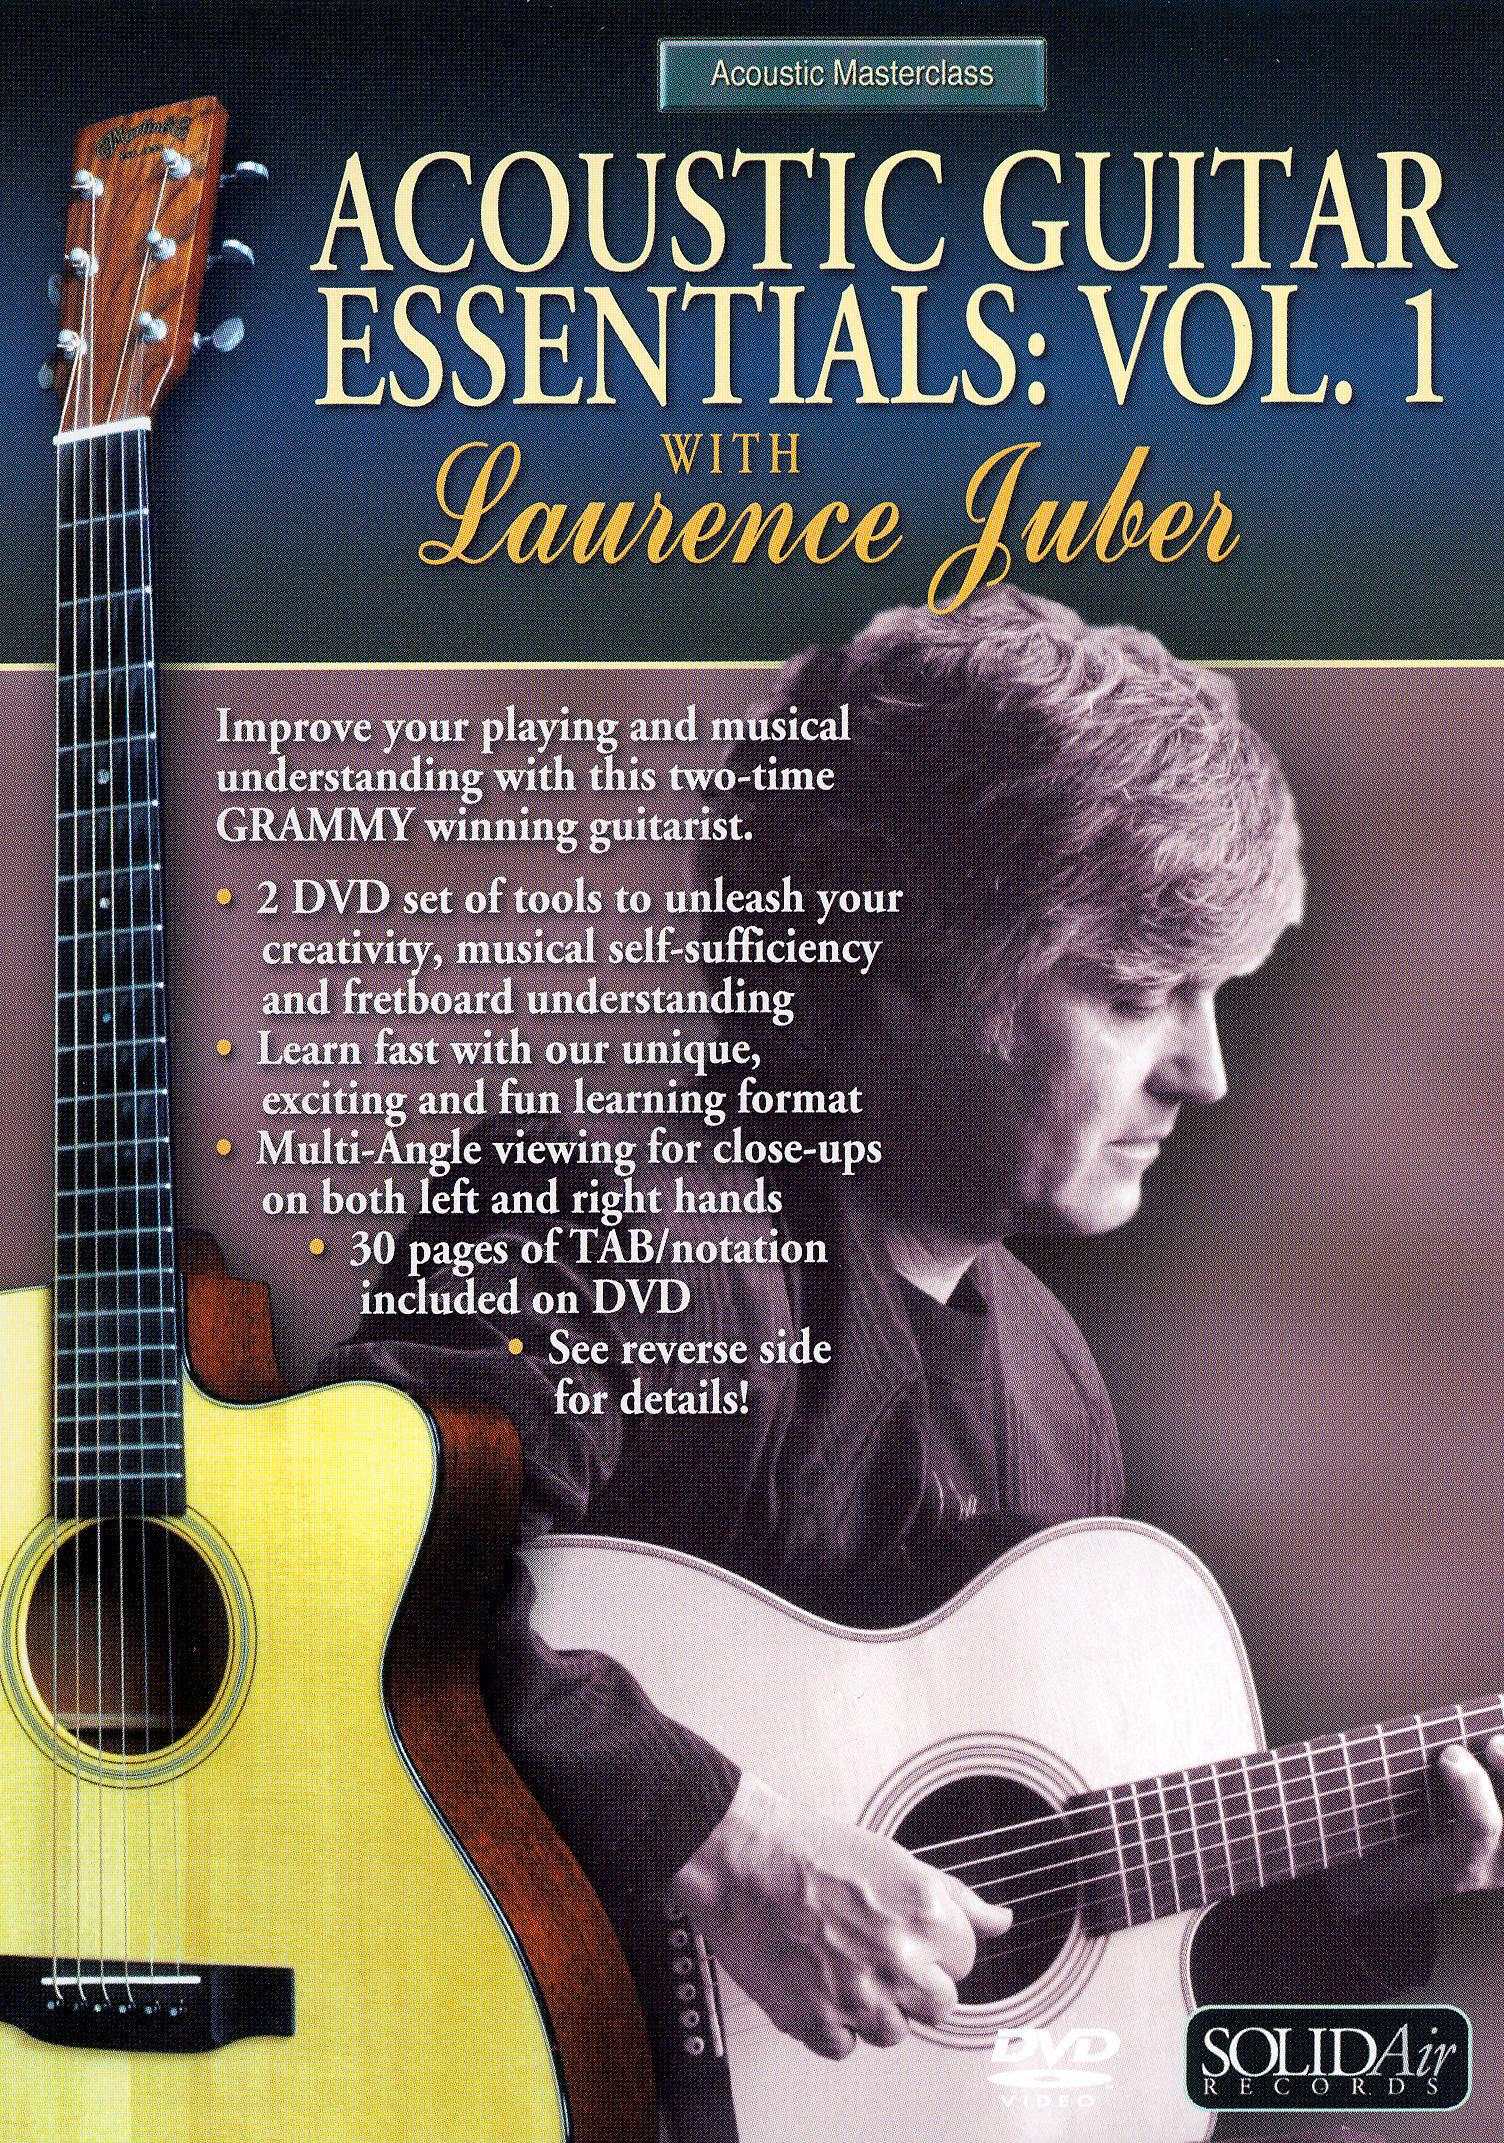 Laurence Juber: Acoustic Guitar Essentials, Vol. 1